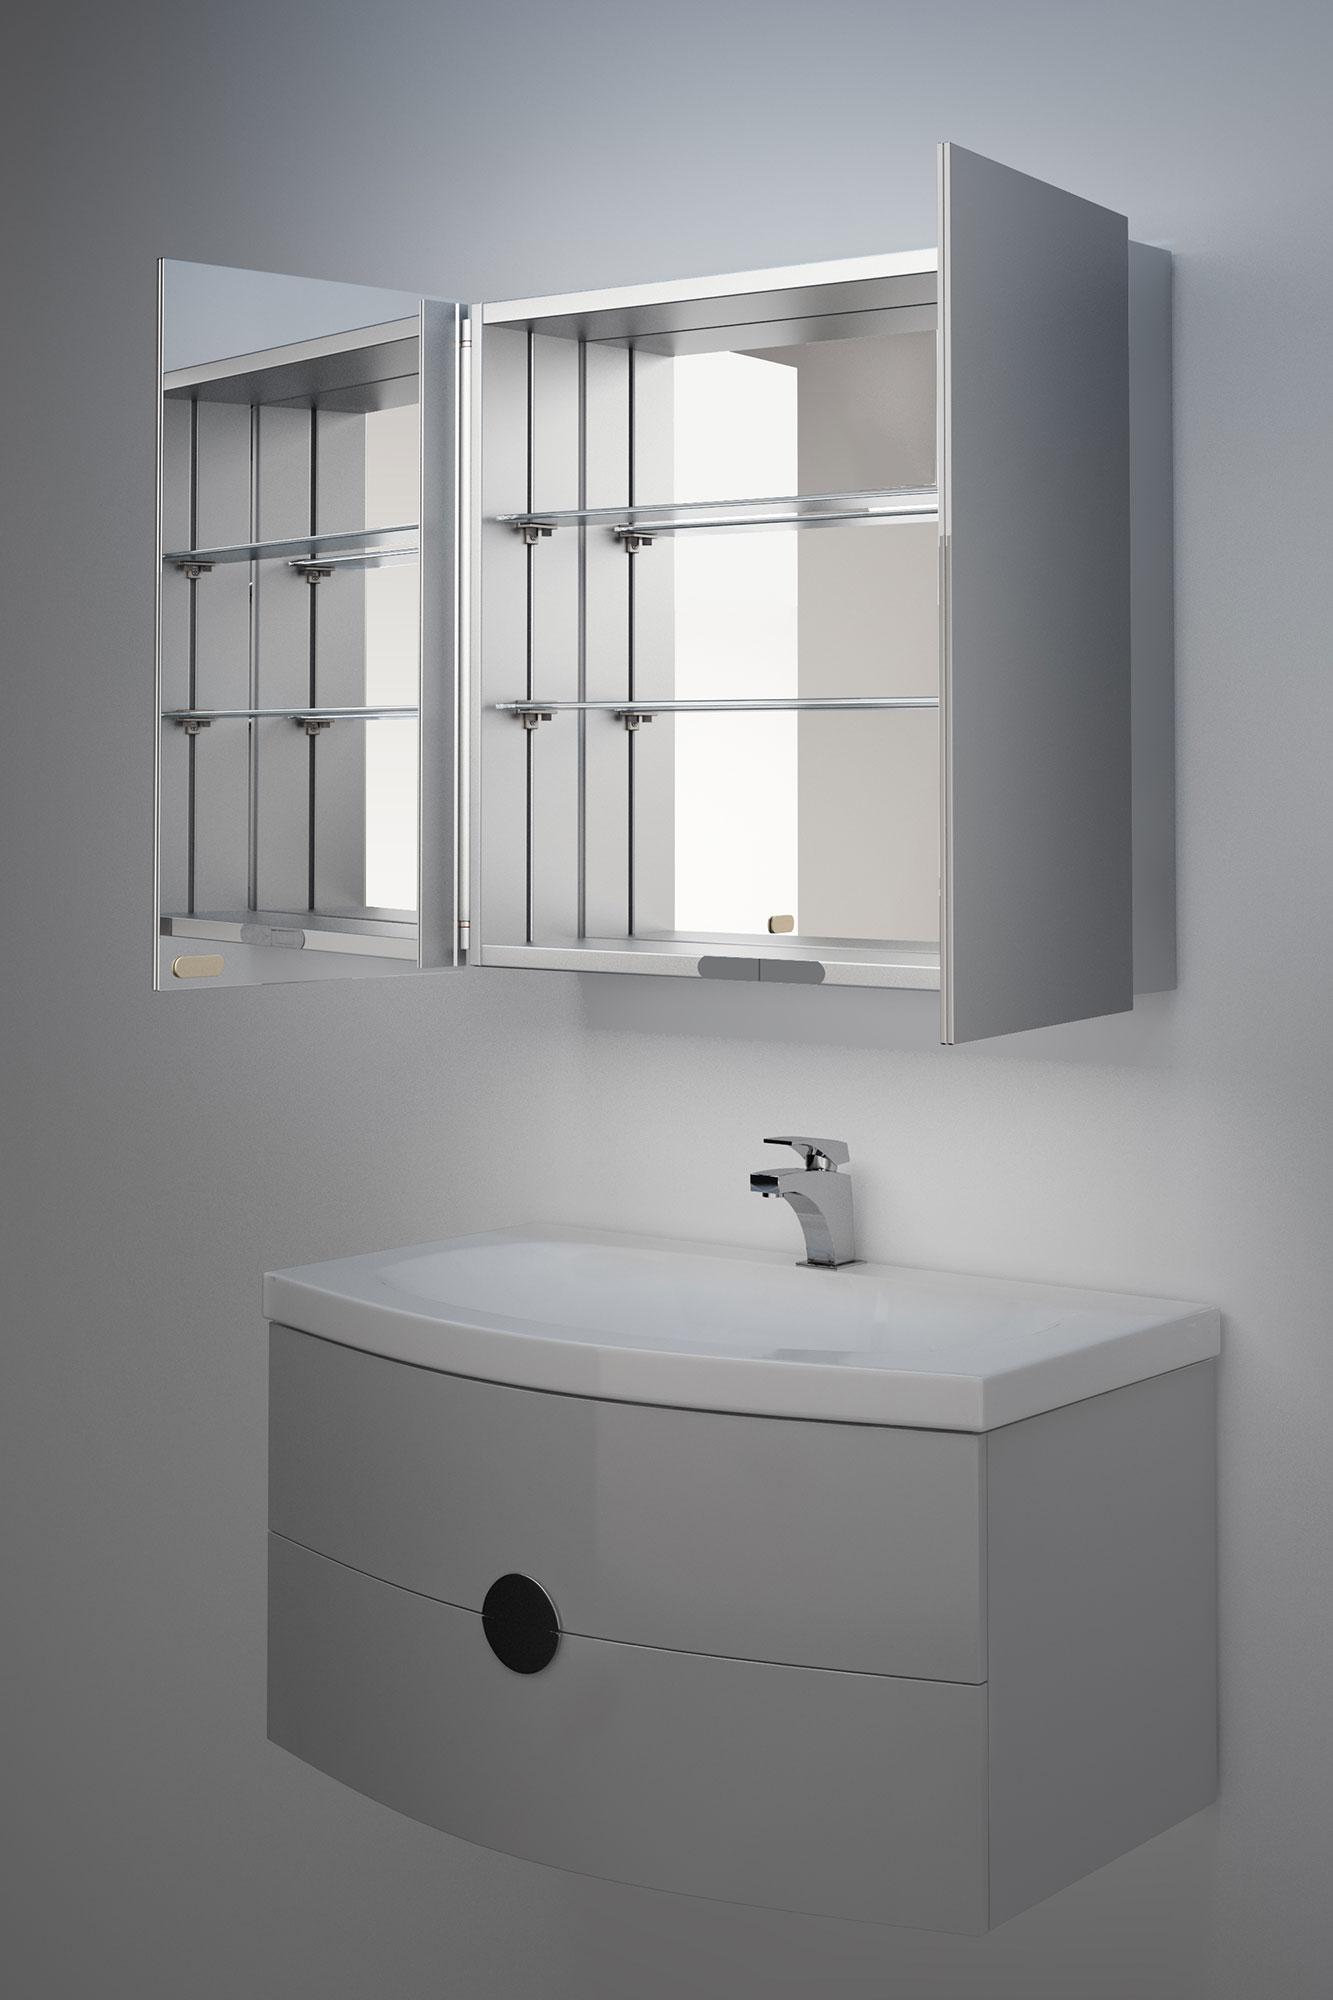 Eleanor Non Illuminated Bathroom Mirror Cabinet K137